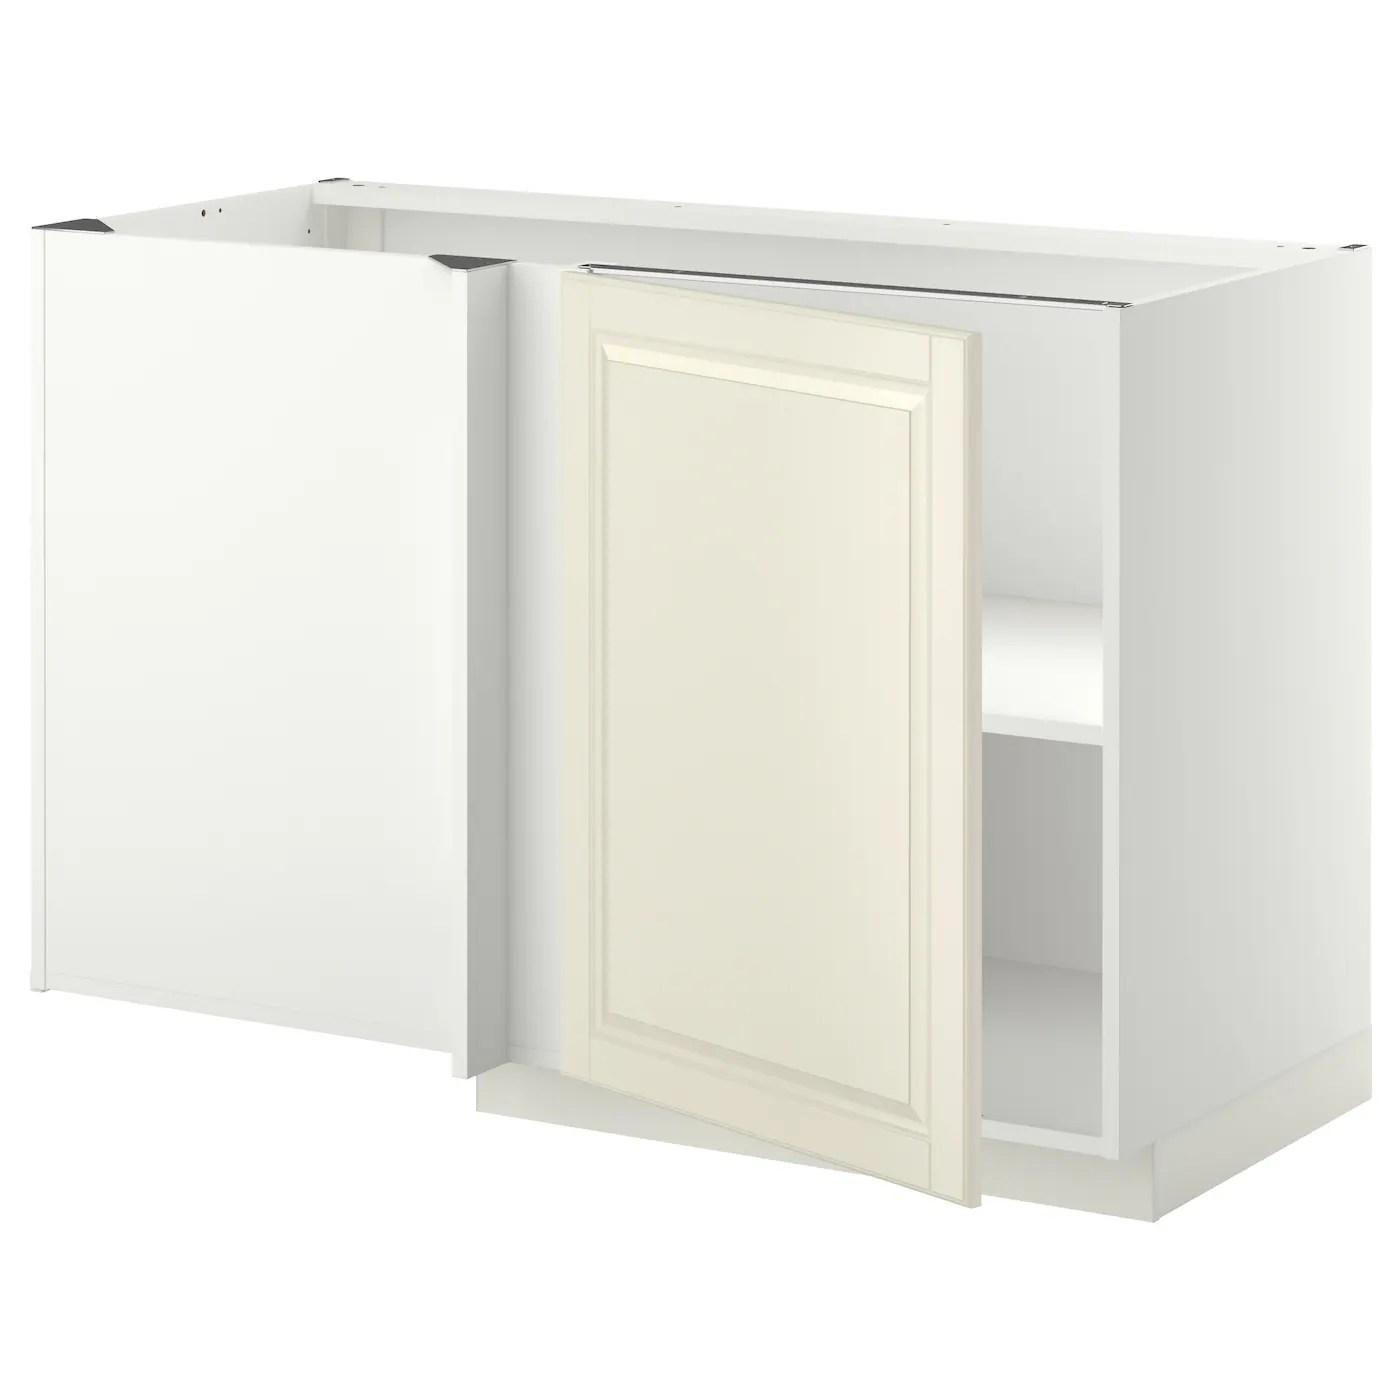 Metod Corner Base Cabinet With Shelf White Bodbyn Off